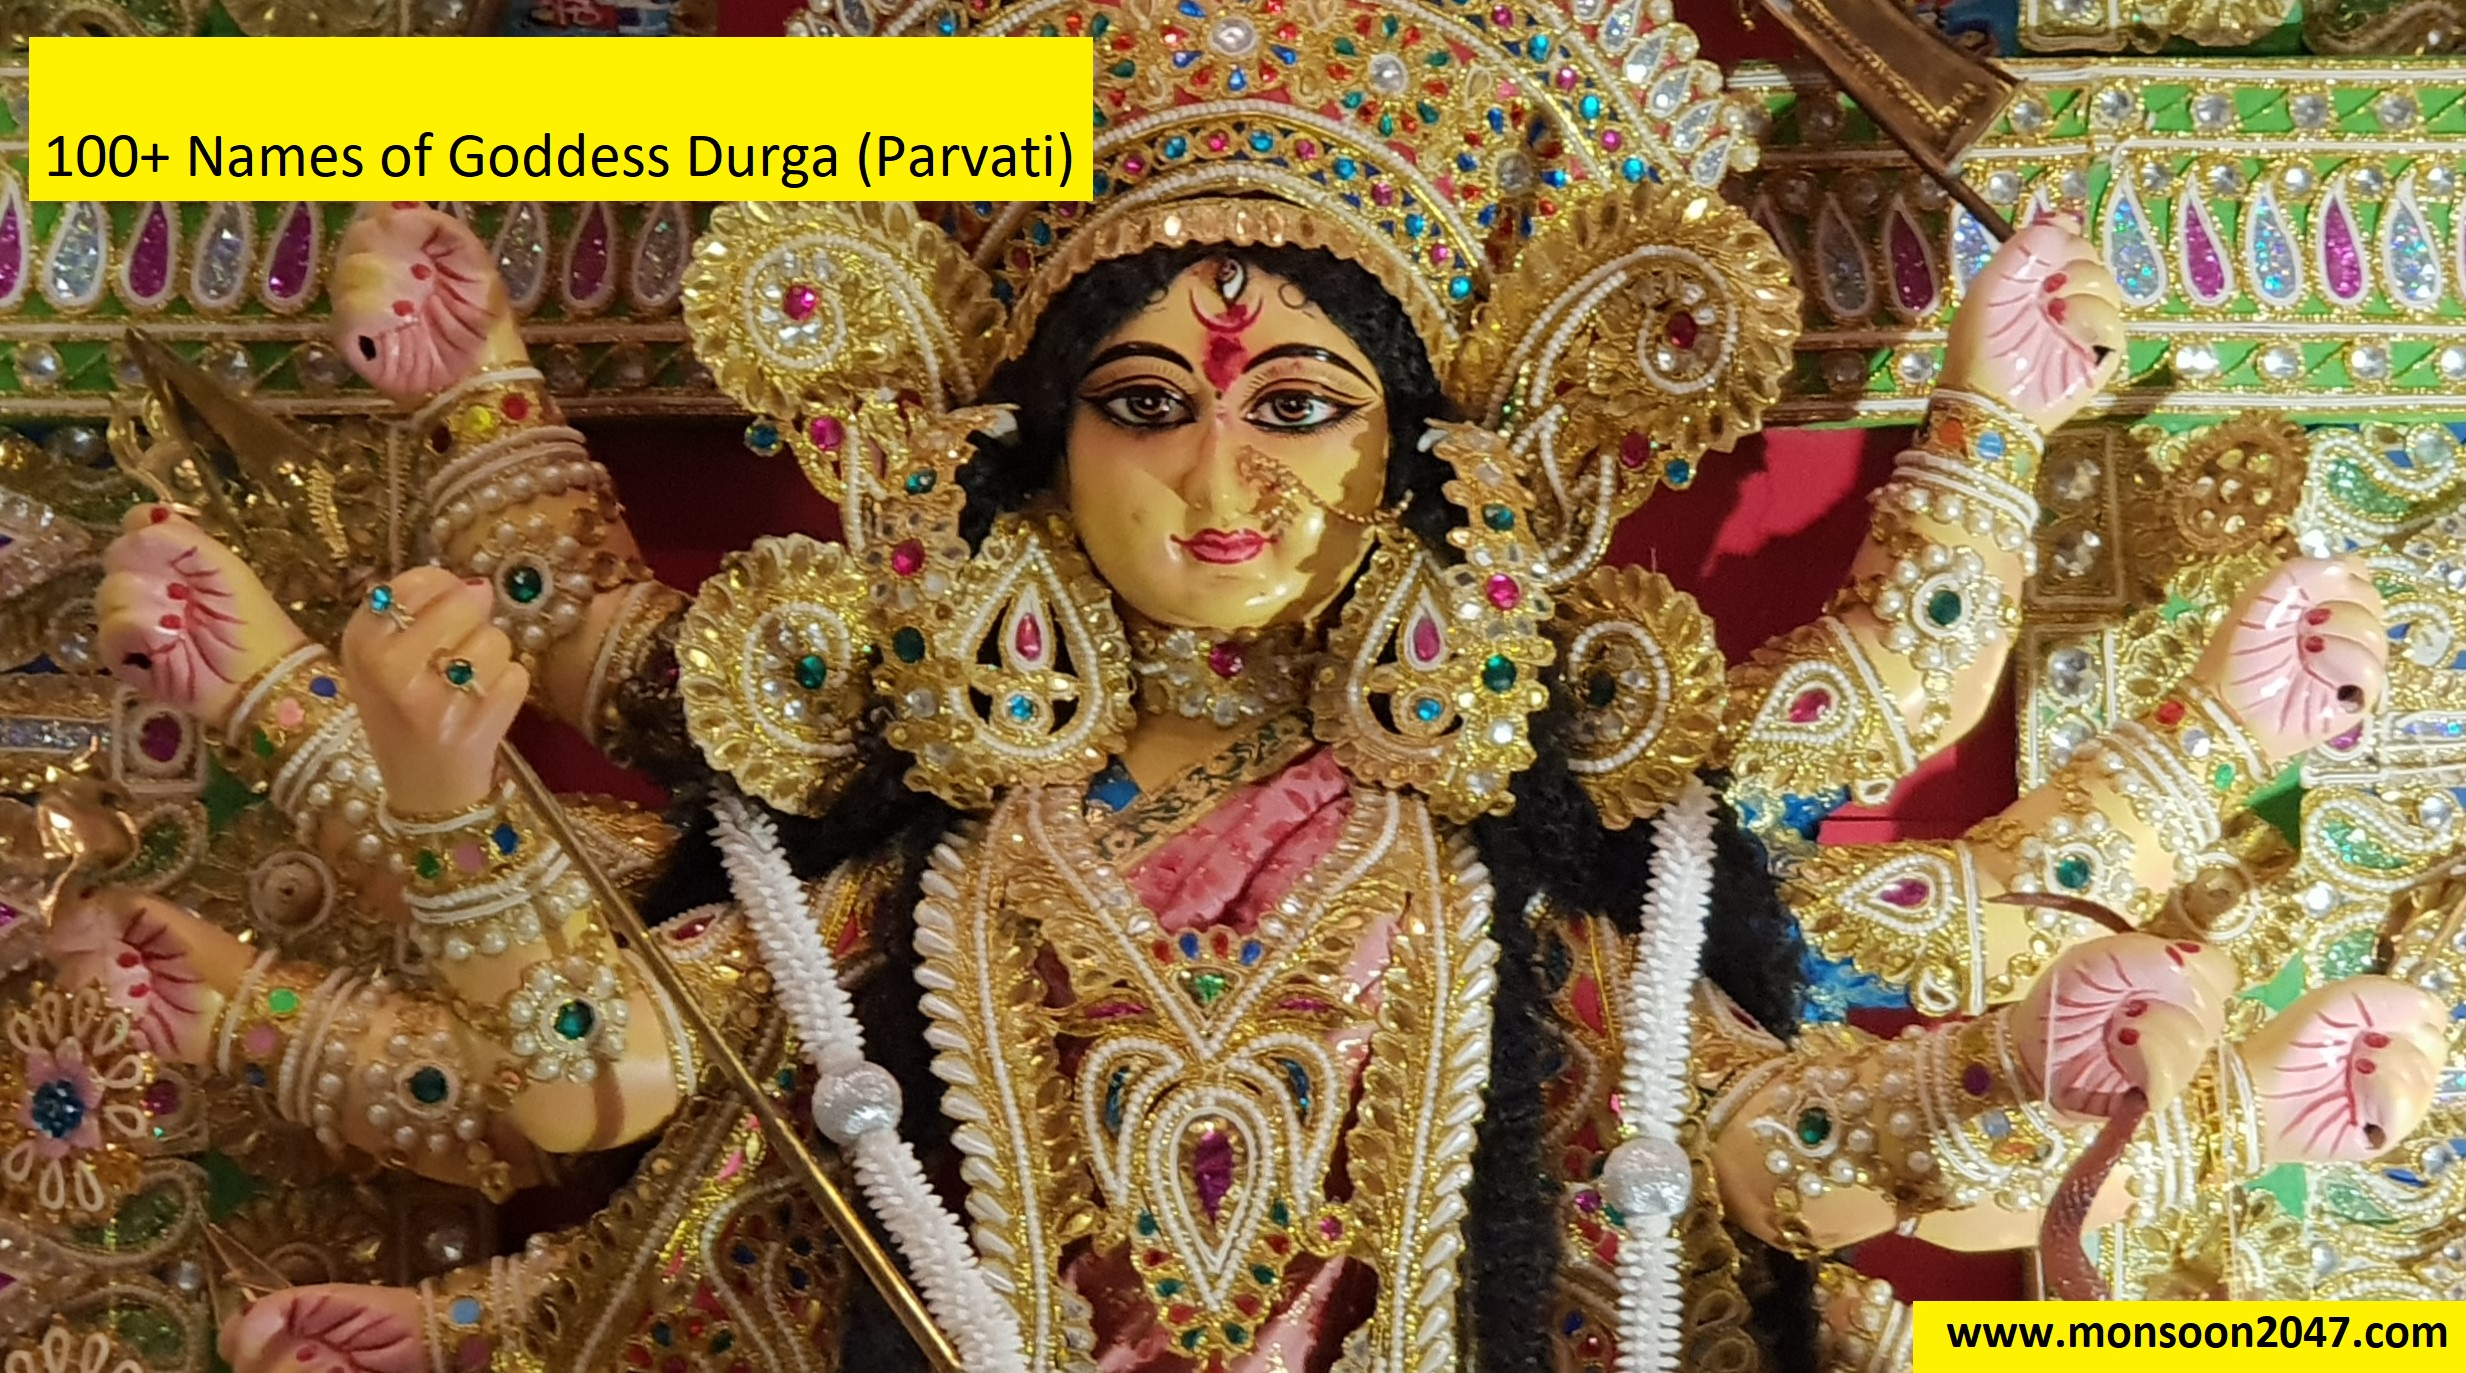 100+ Names of Goddess Durga